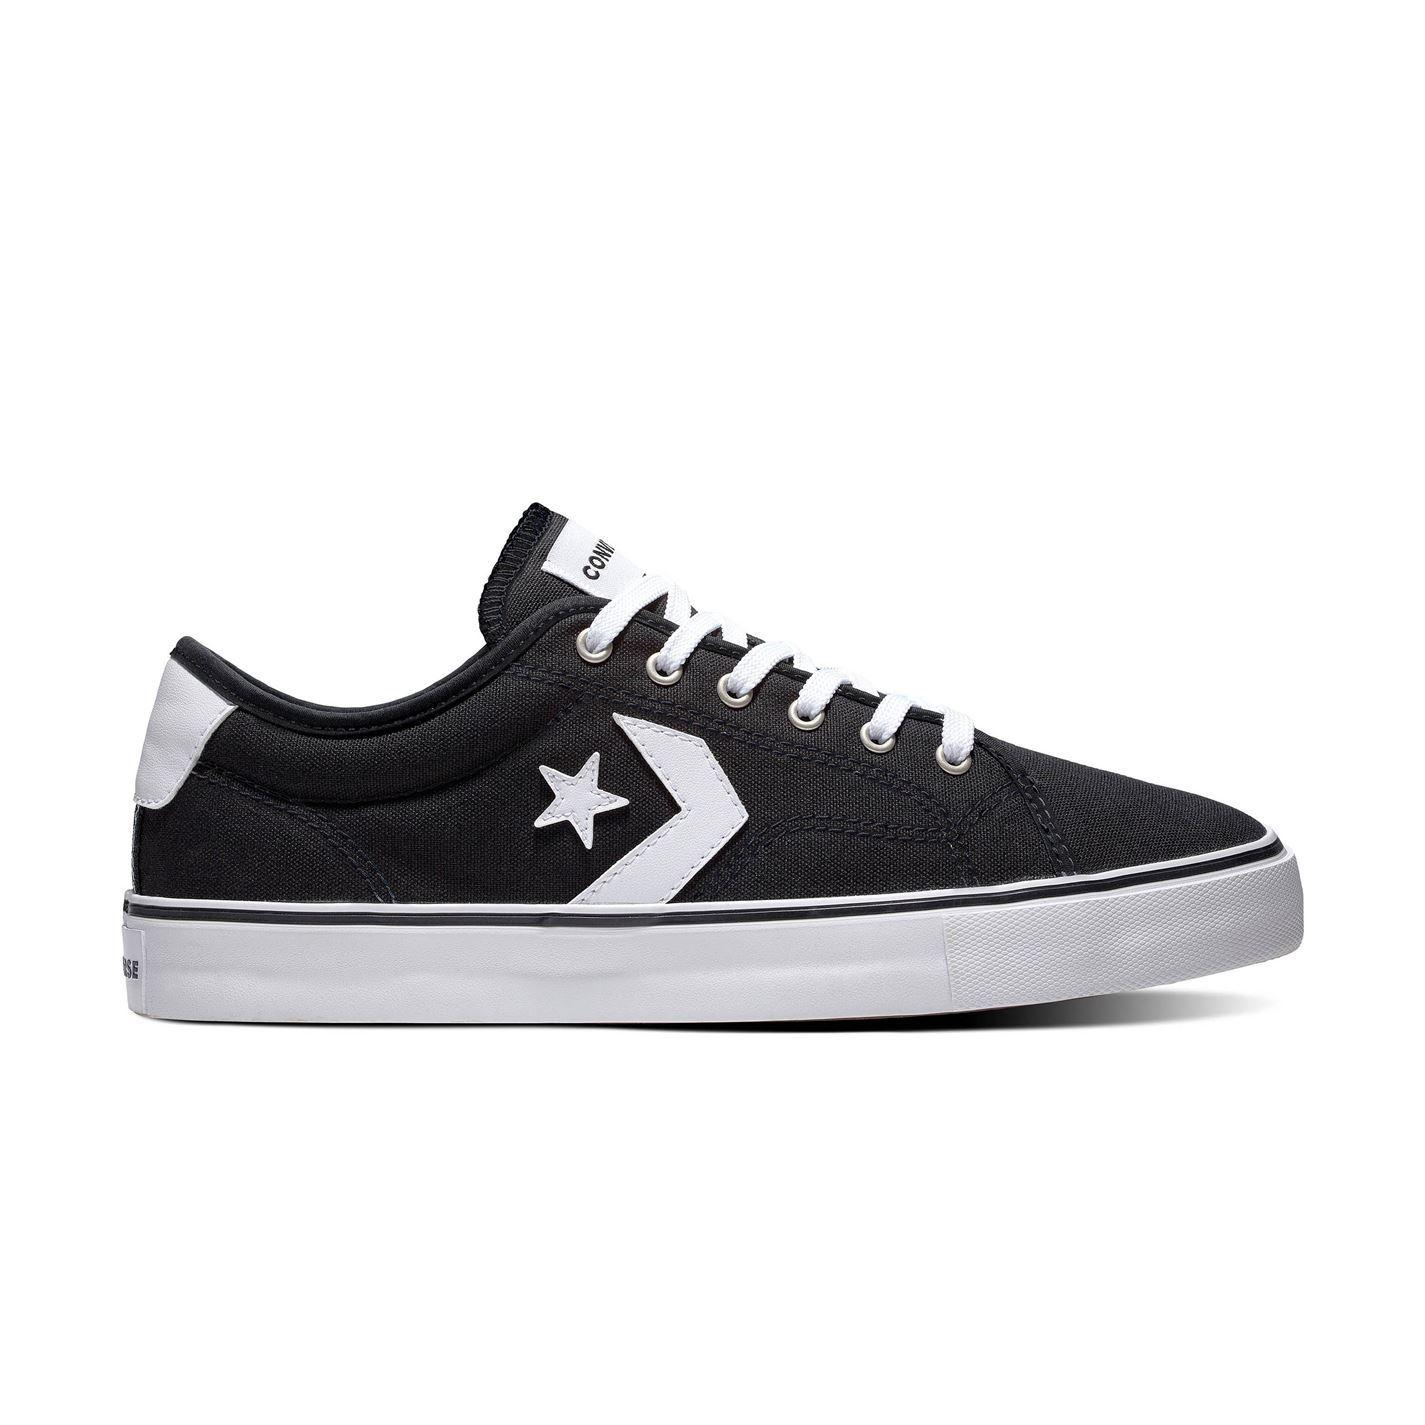 Converse-Ox-REPLAY-Baskets-Pour-Homme-Chaussures-De-Loisirs-Chaussures-Baskets miniature 10